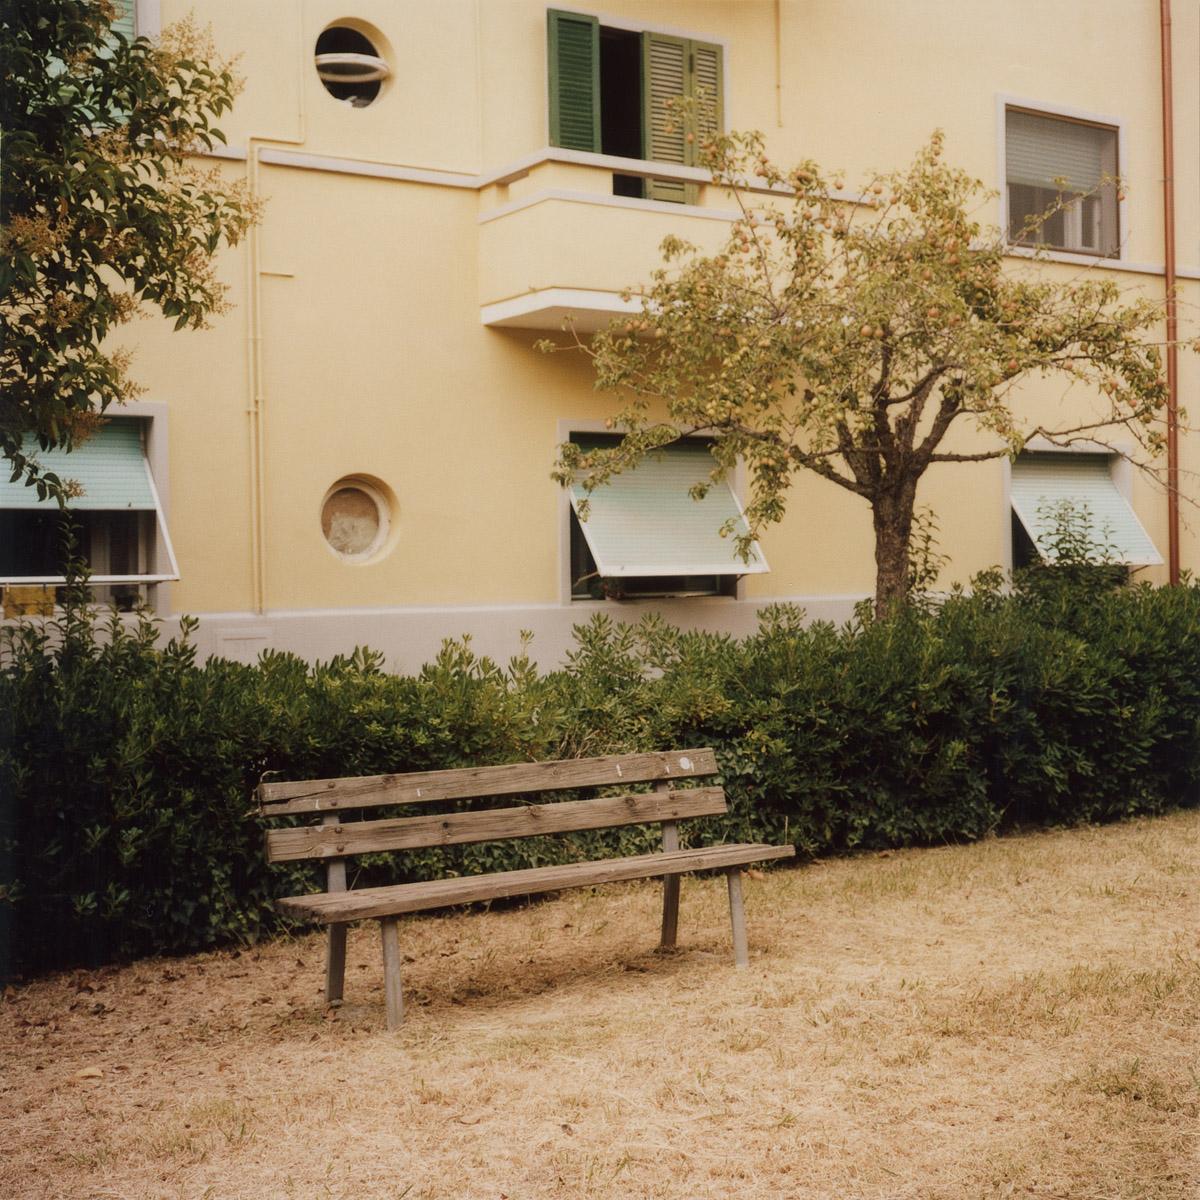 DavideCerretini Terra Di Provincia Photography 2